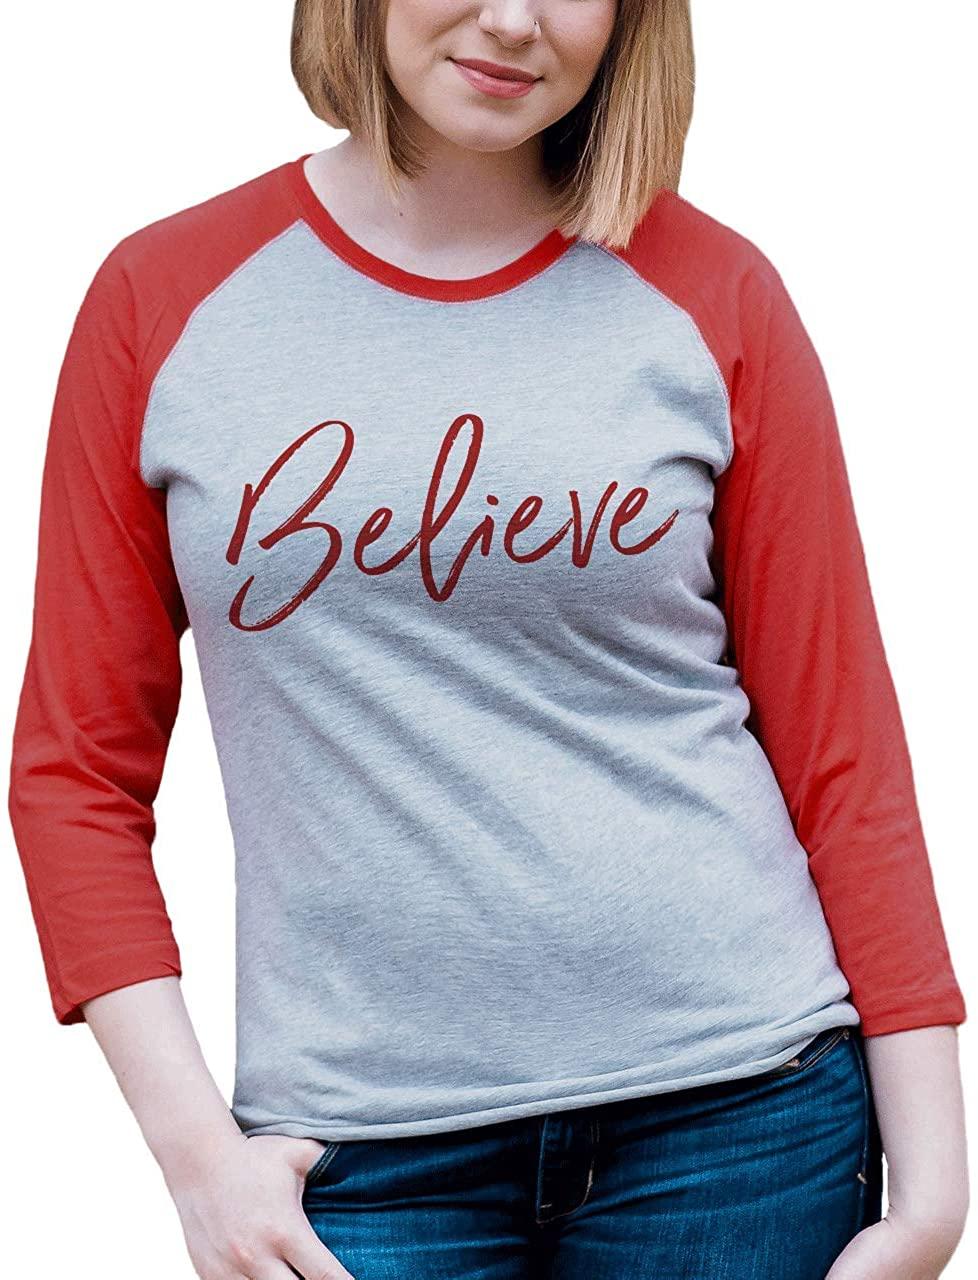 7 ate 9 Apparel Women's Believe Christmas Raglan Tee XL Red